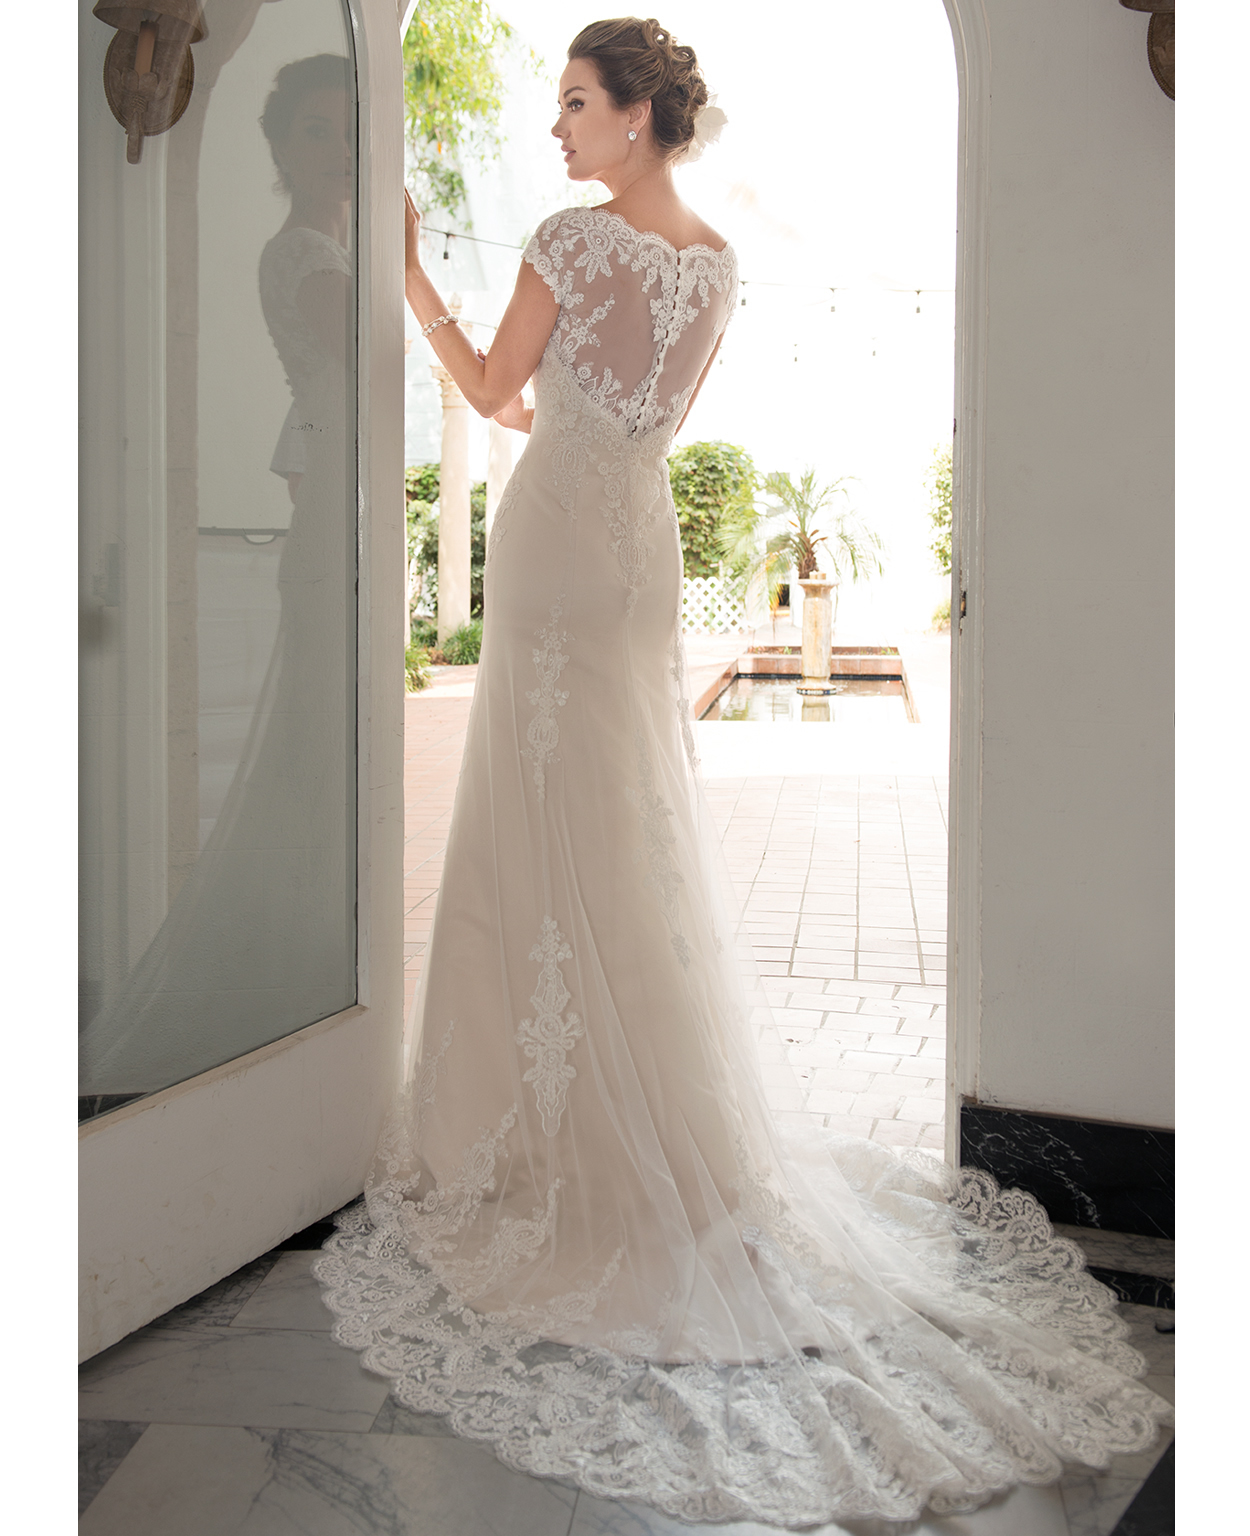 Model wearing an 'A line' style Venus Bridal dress